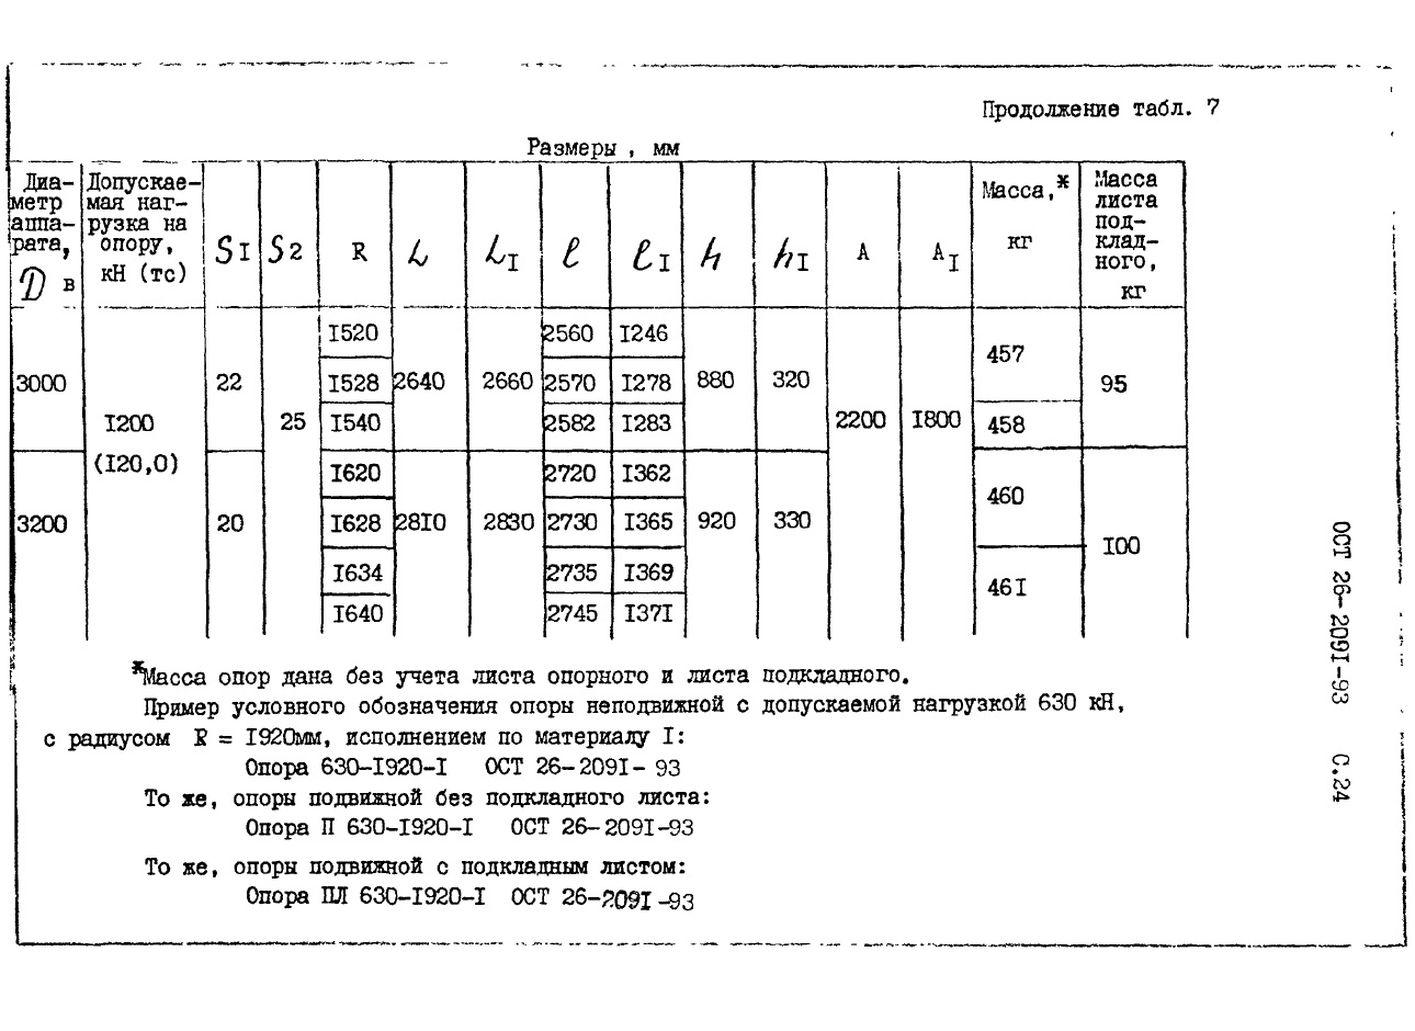 Опоры тип 3 ОСТ 26-2091-93 стр.7